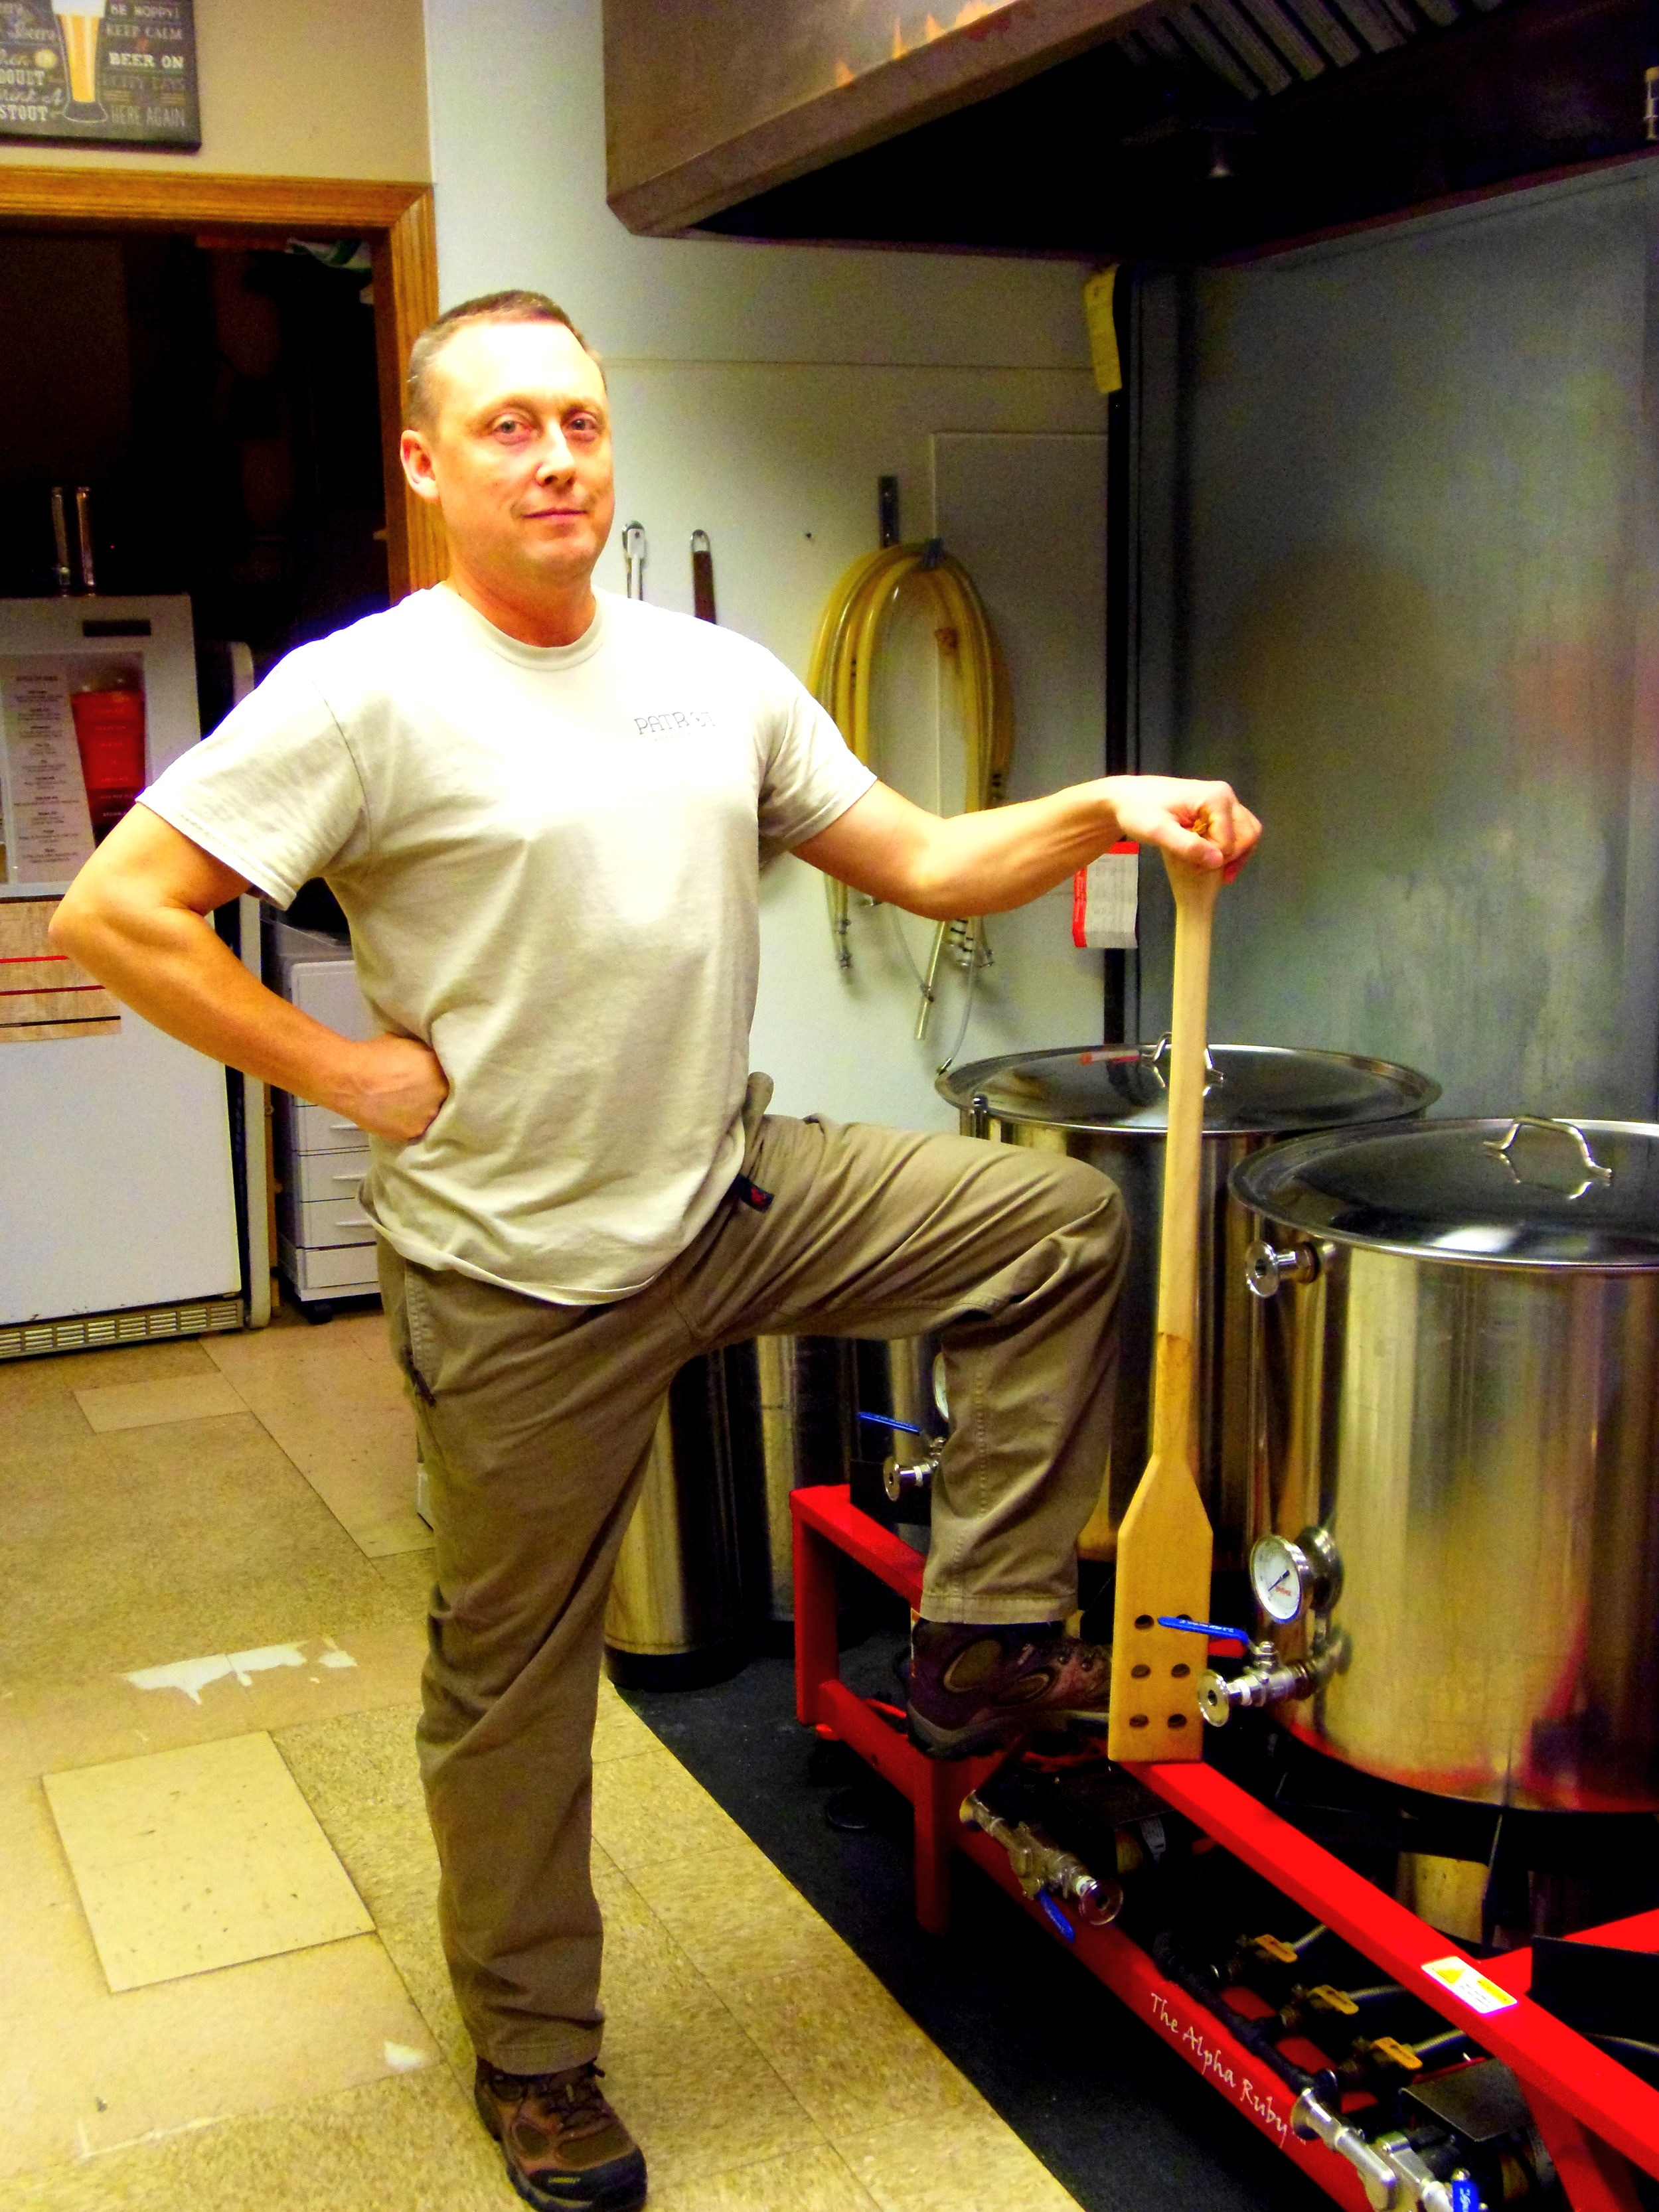 Matt looks right at home near the brew kettles